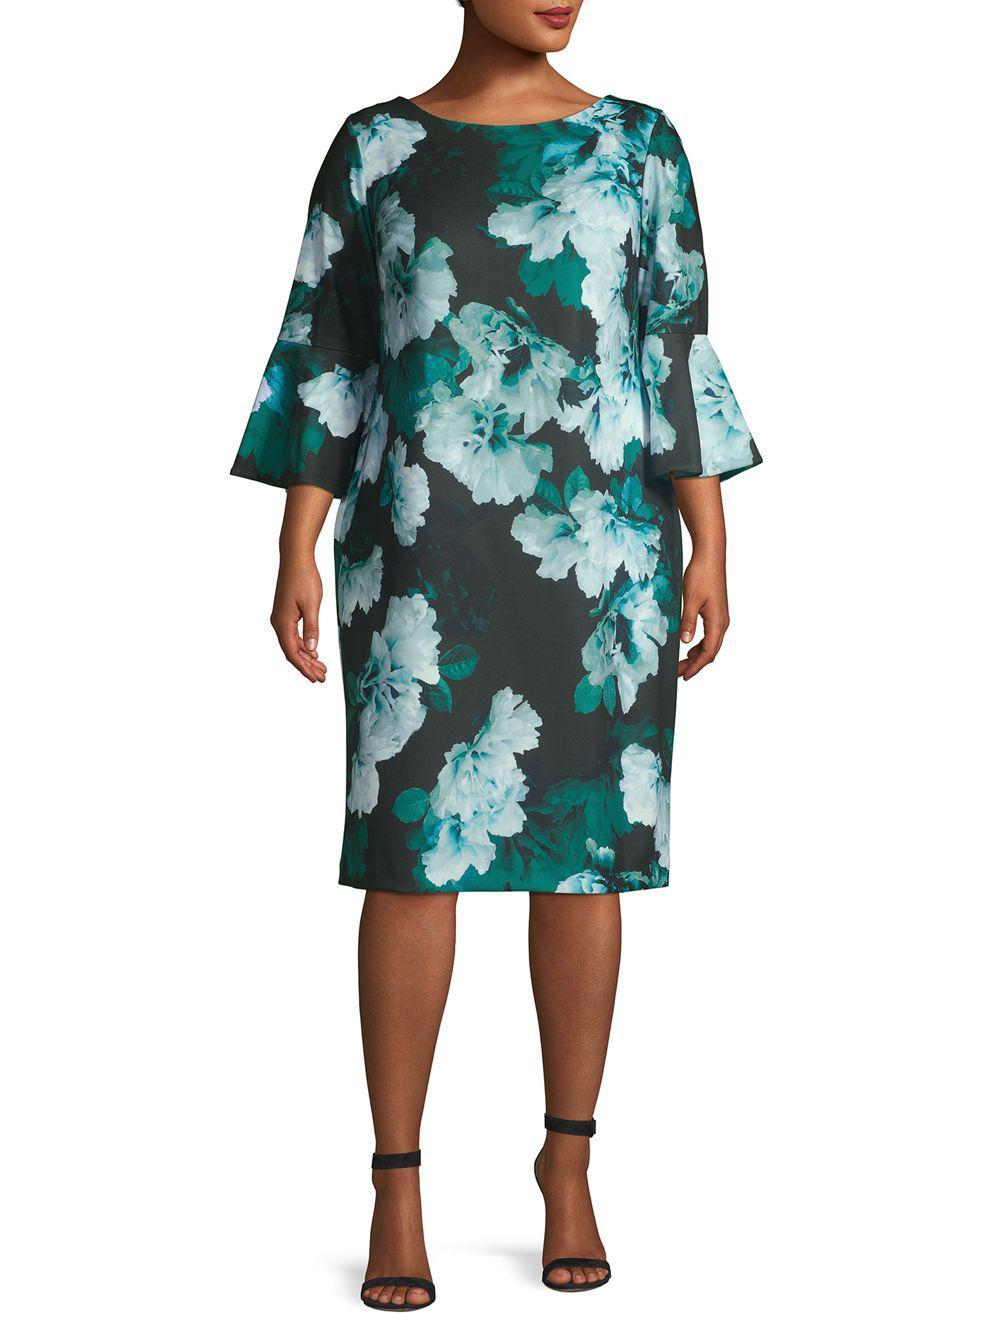 0e0b1bb815c3 Lyst - Calvin Klein Plus Floral Printed Shift Dress in Green